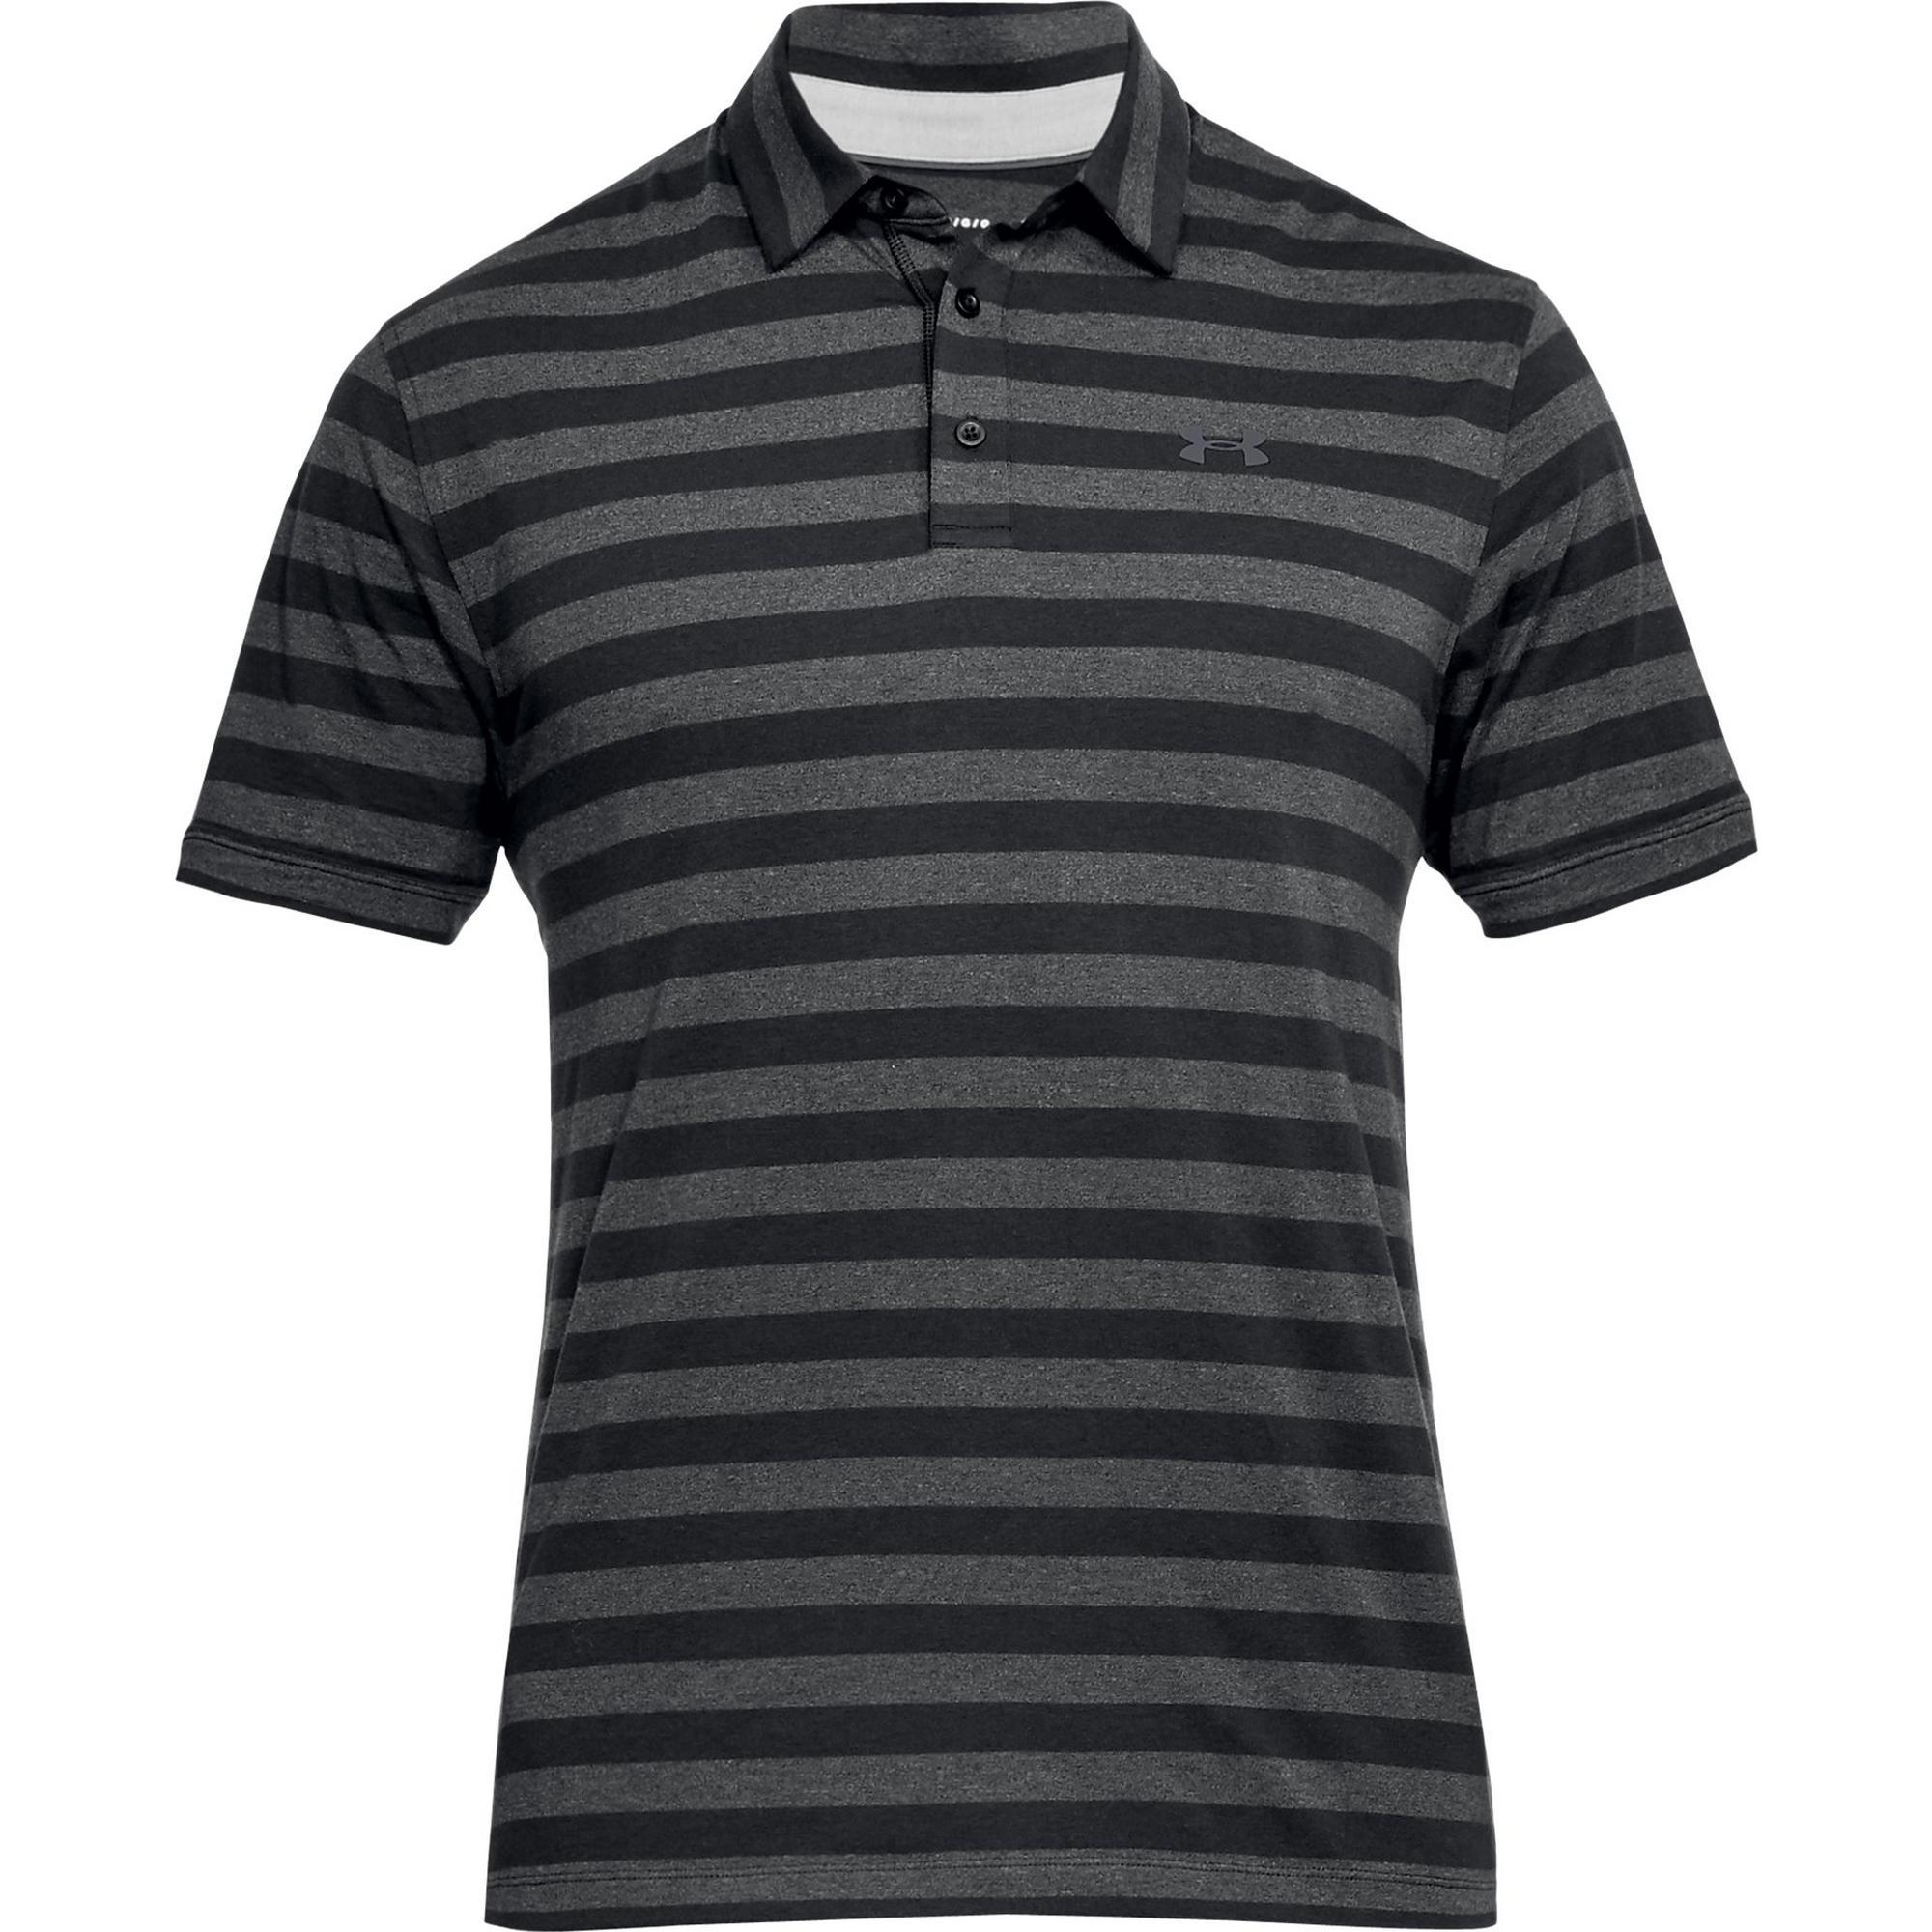 Men's Charged Cotton Scramble Stripe Short Sleeve Polo